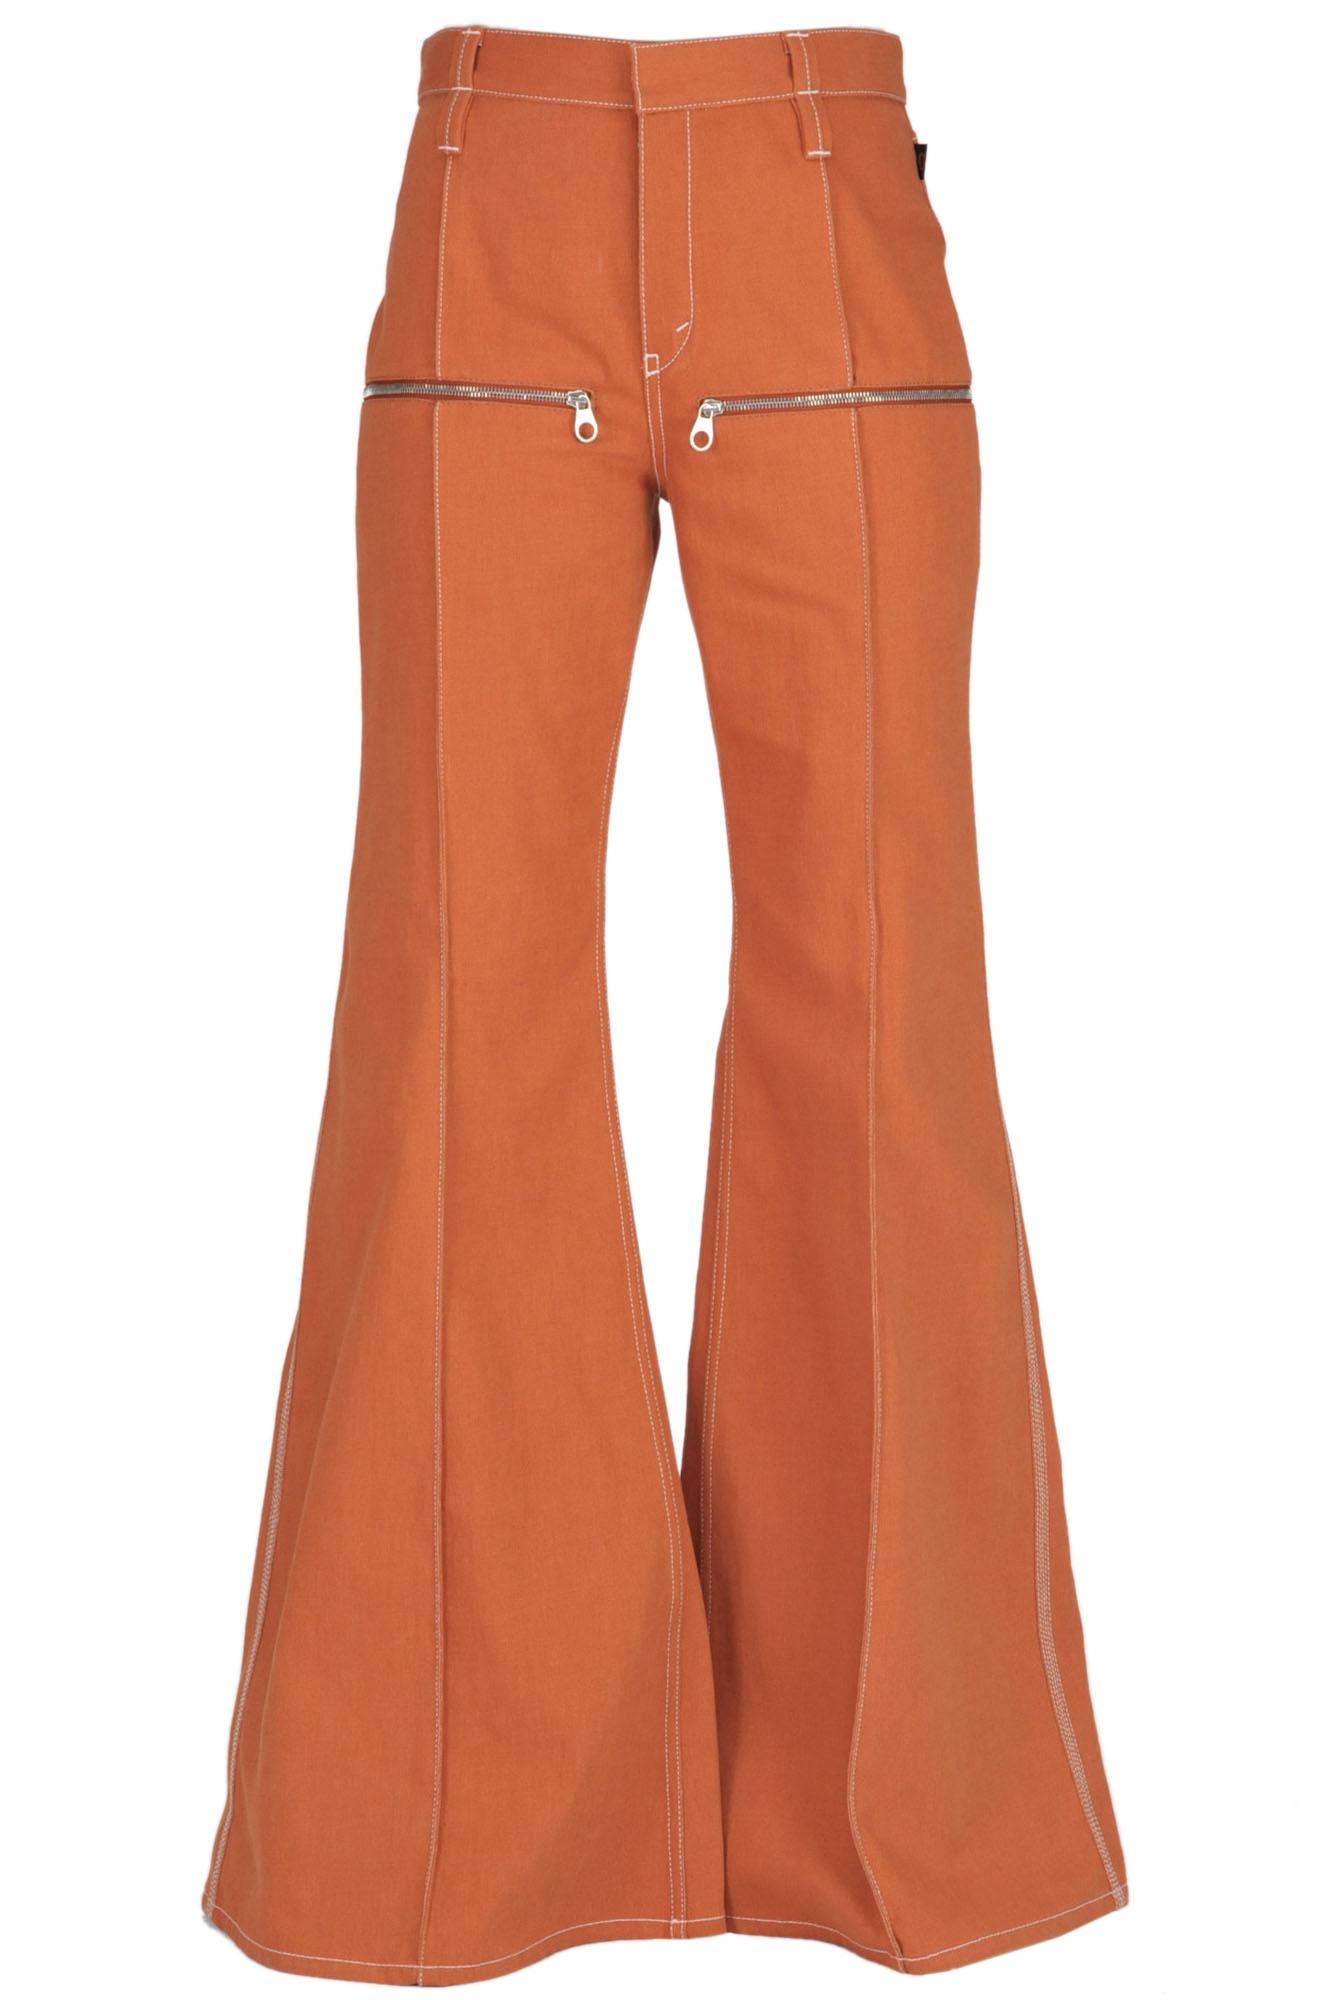 ChloÉ Flared Leg Jeans In Copper